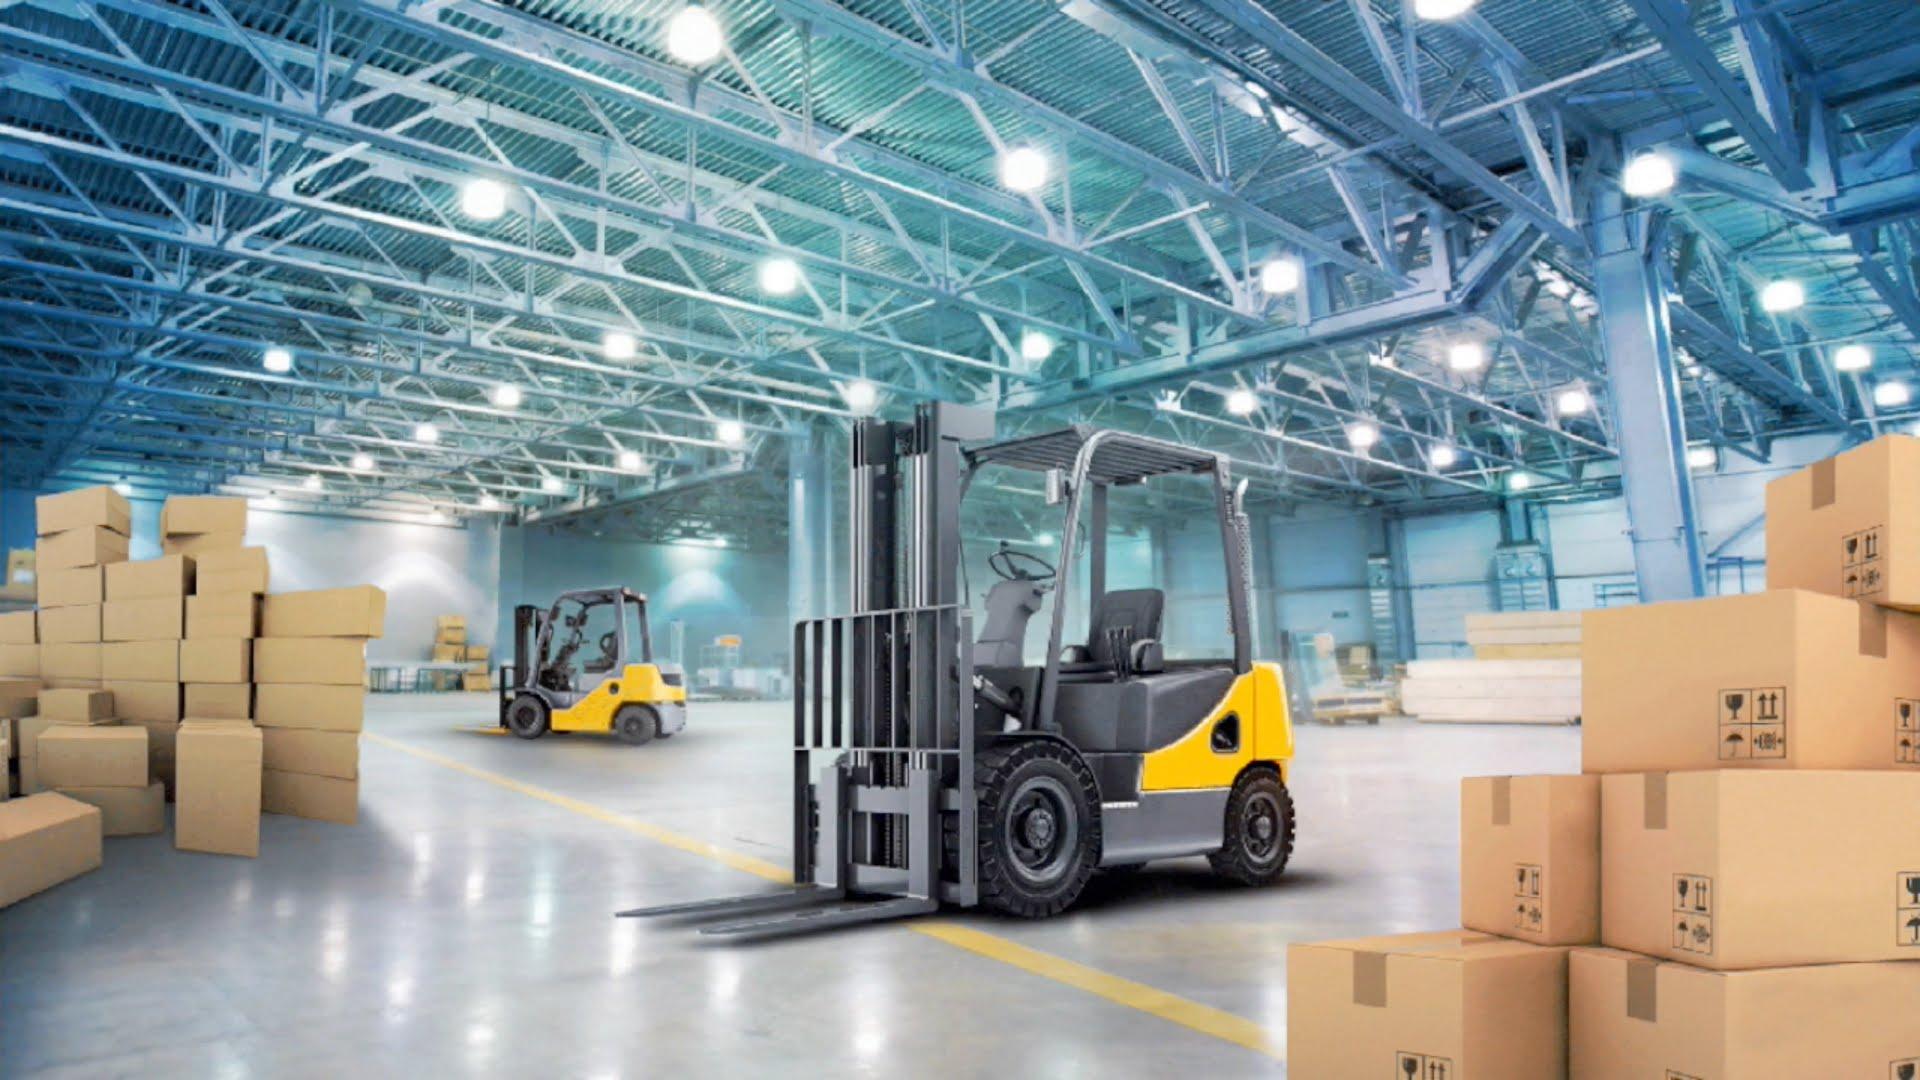 İzmirde Kiralık Forklift Firması